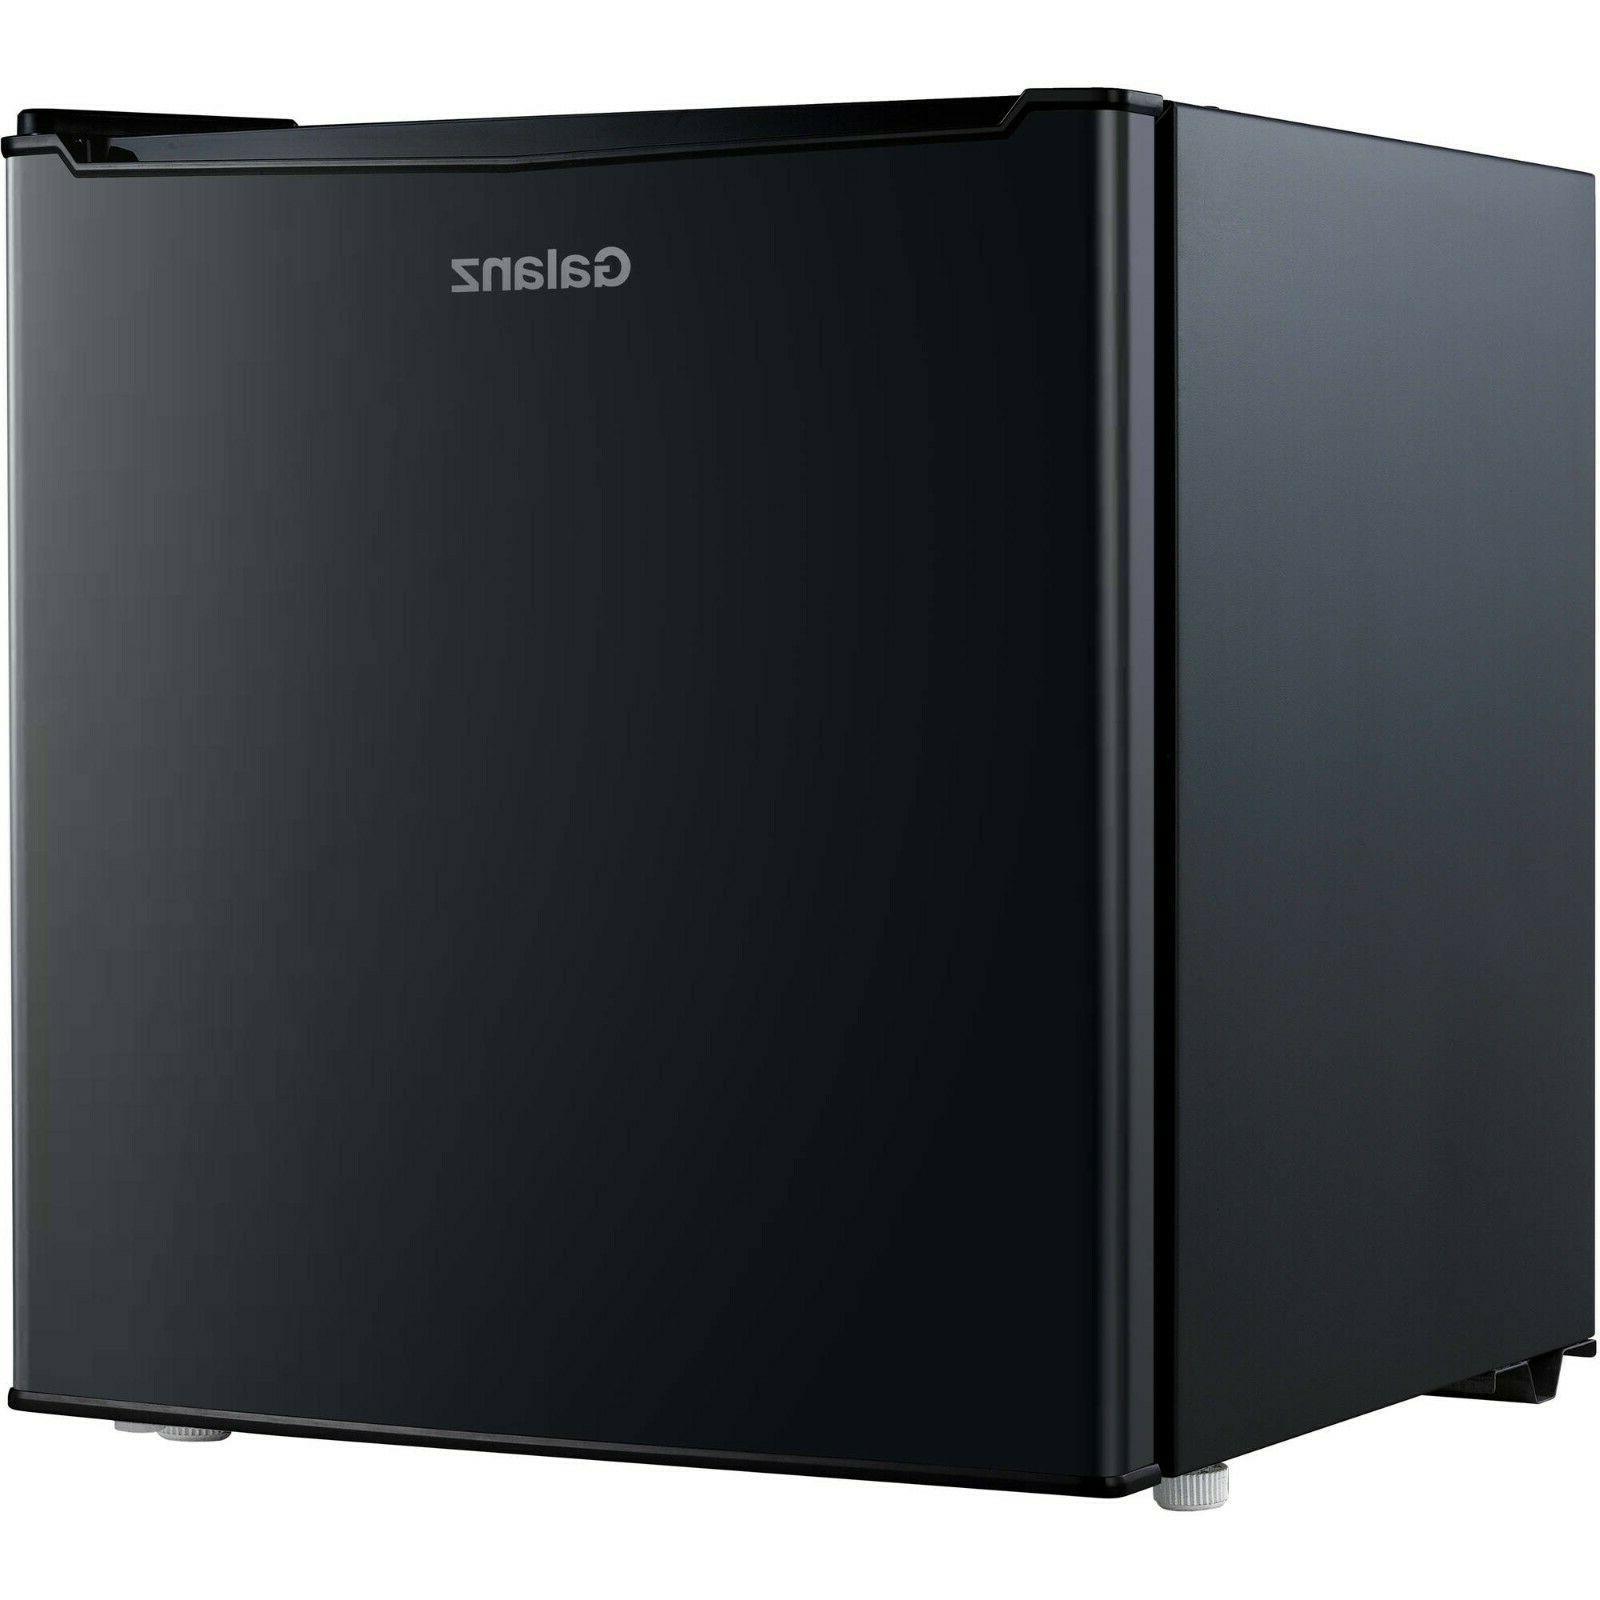 Single compact portable shelf cooler Black